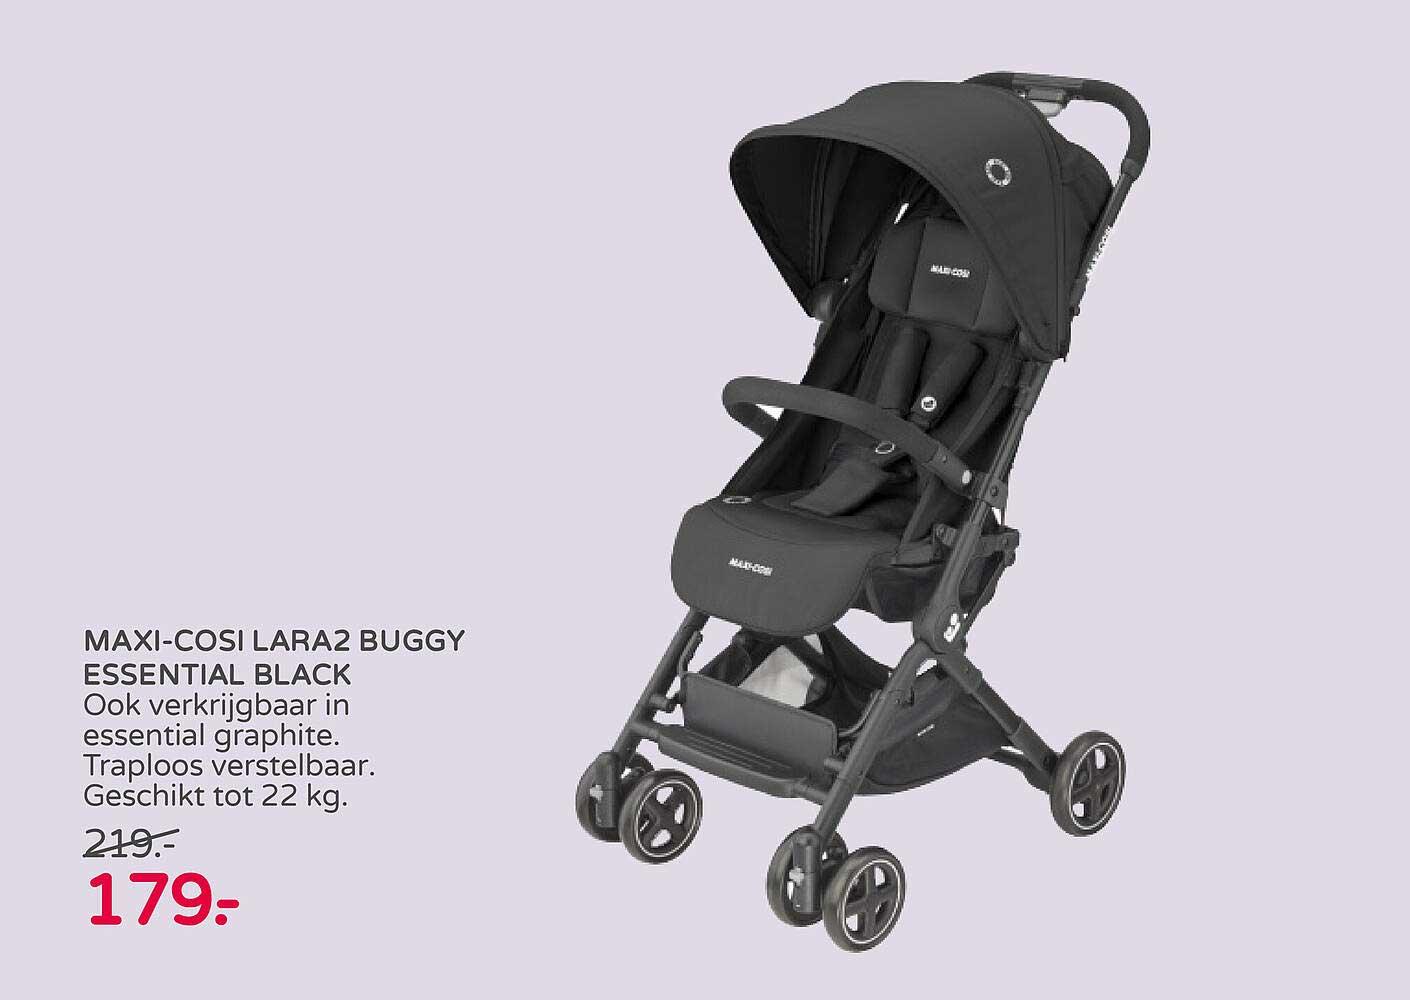 Prénatal Maxi-Cosi Lara2 Buggy Essential Black